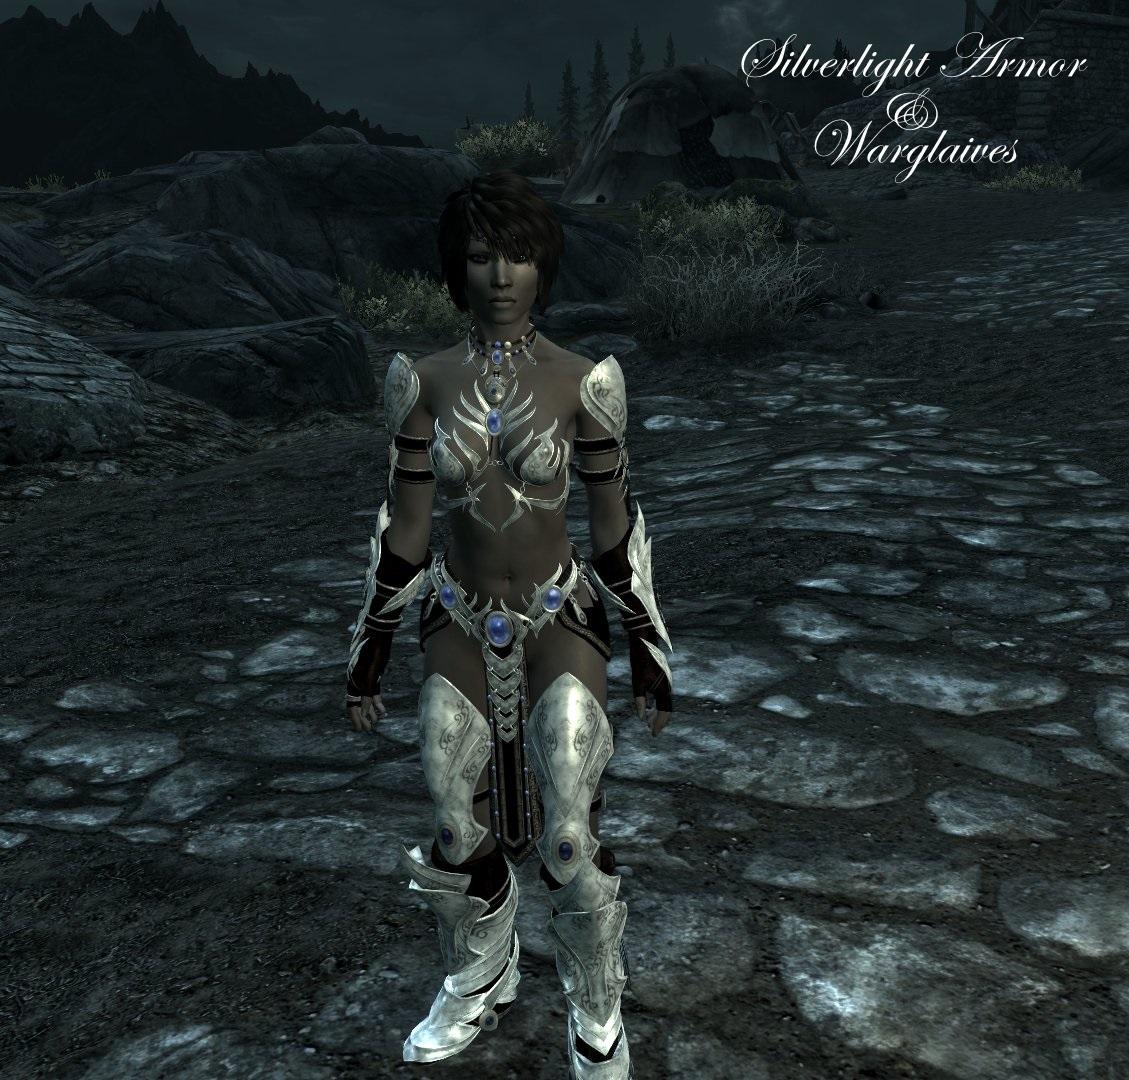 Silverlight_armor_&_Warglaives.jpeg